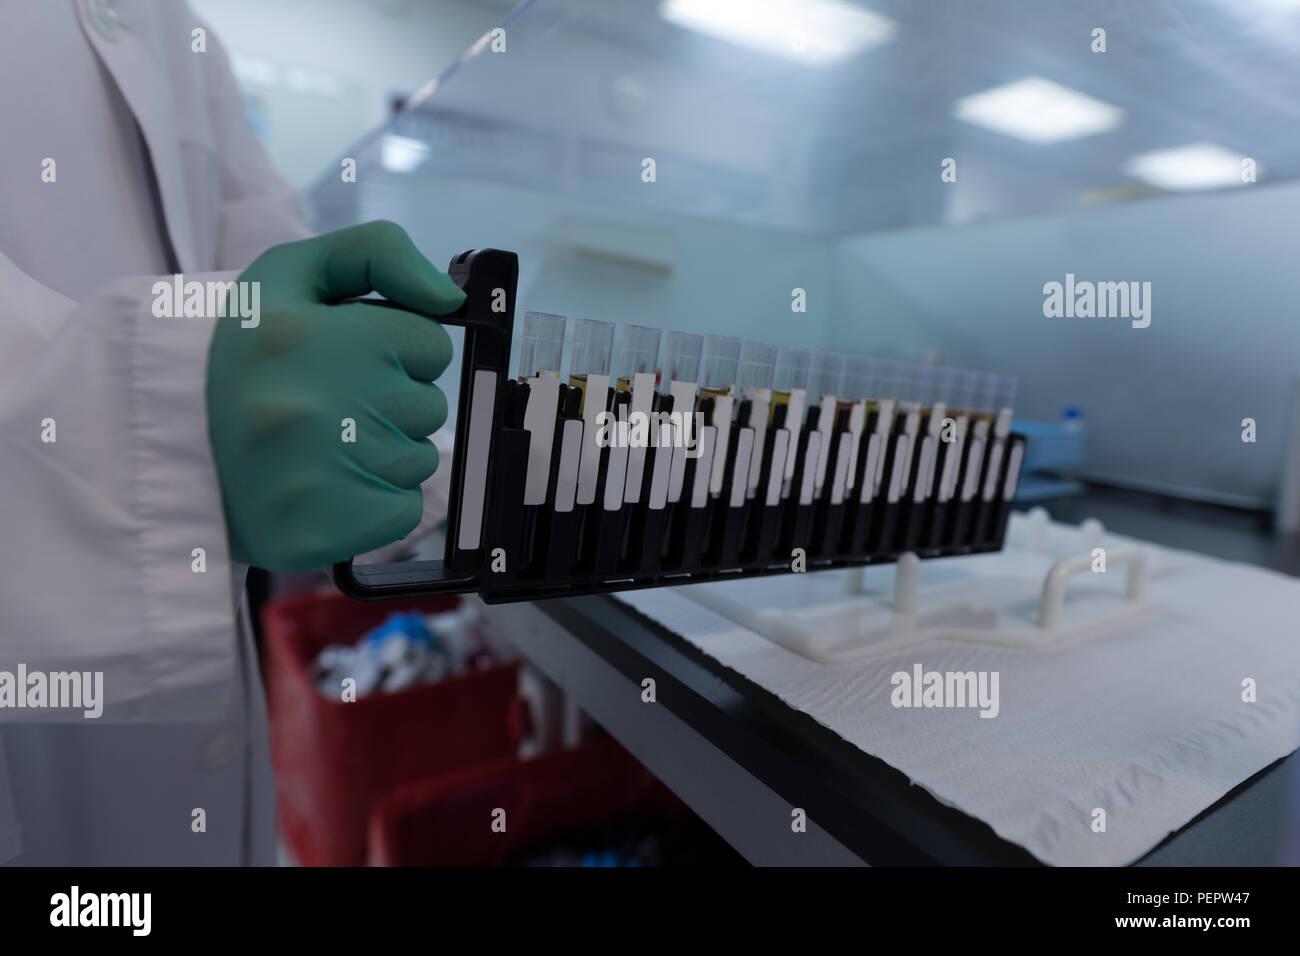 Laboratory technician holding test tubes - Stock Image